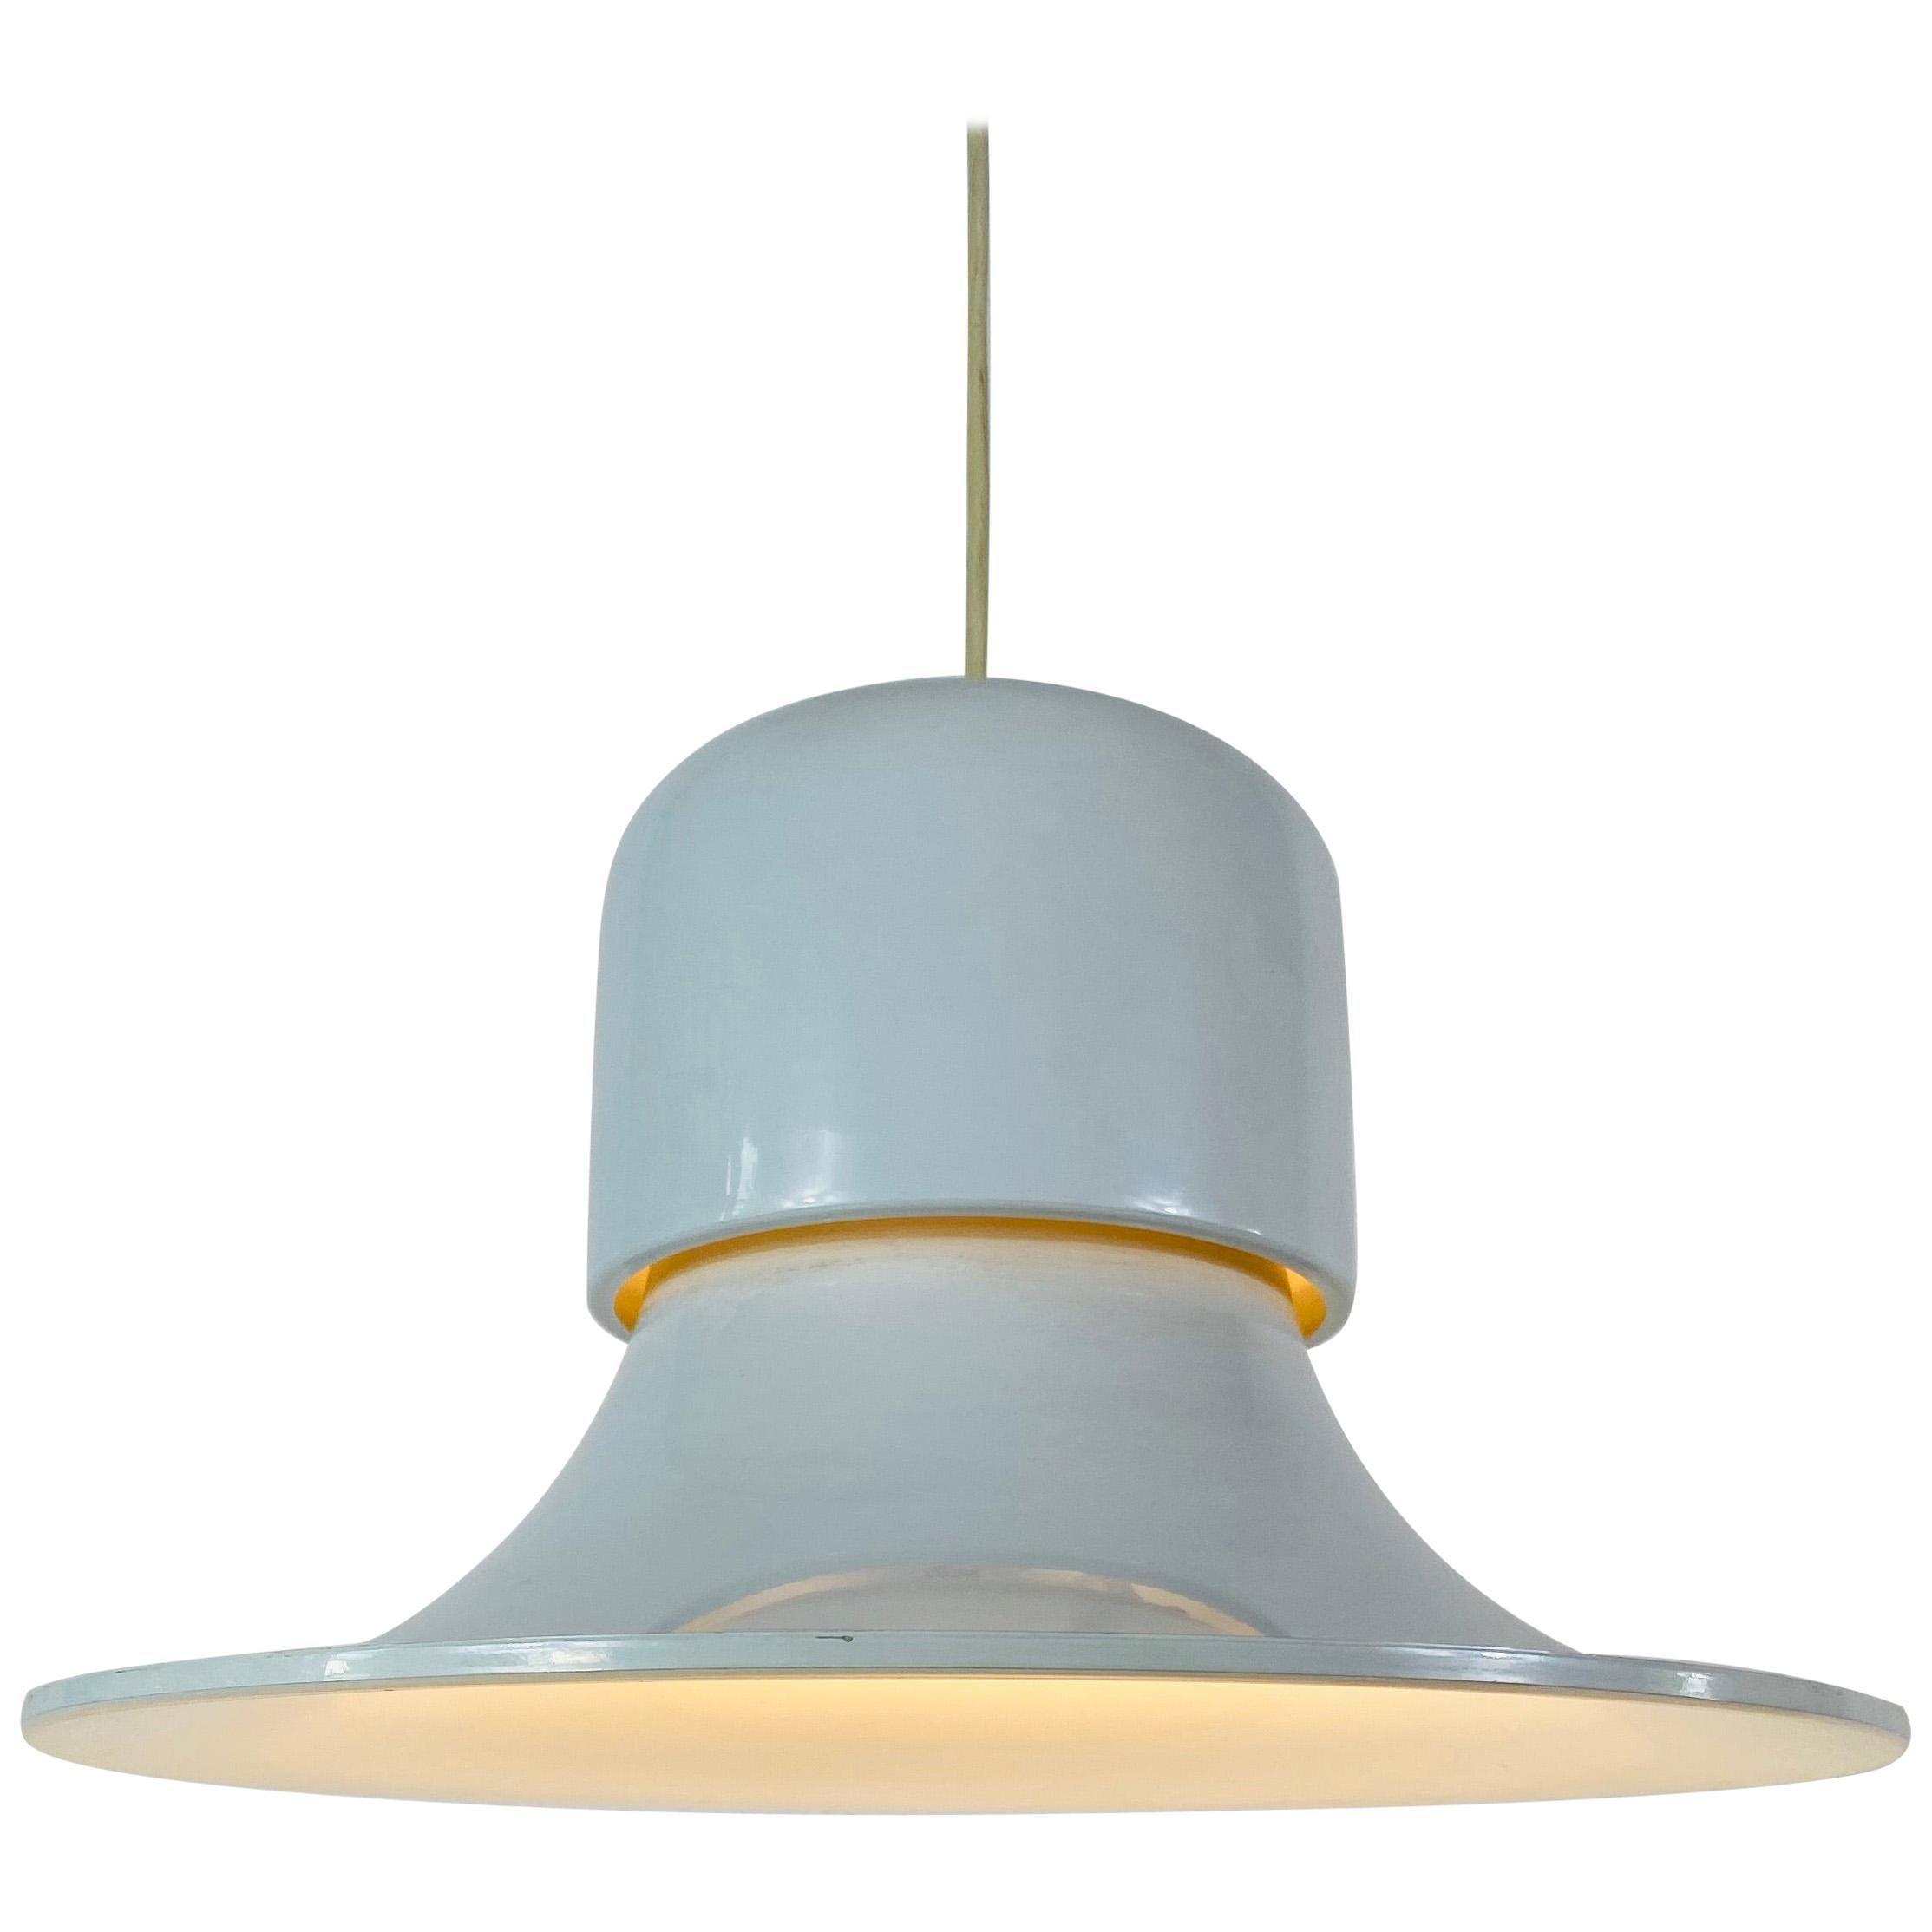 White Metal Hanging Lamp by Joe Colombo Stilnovo Style, Italy, 1950s